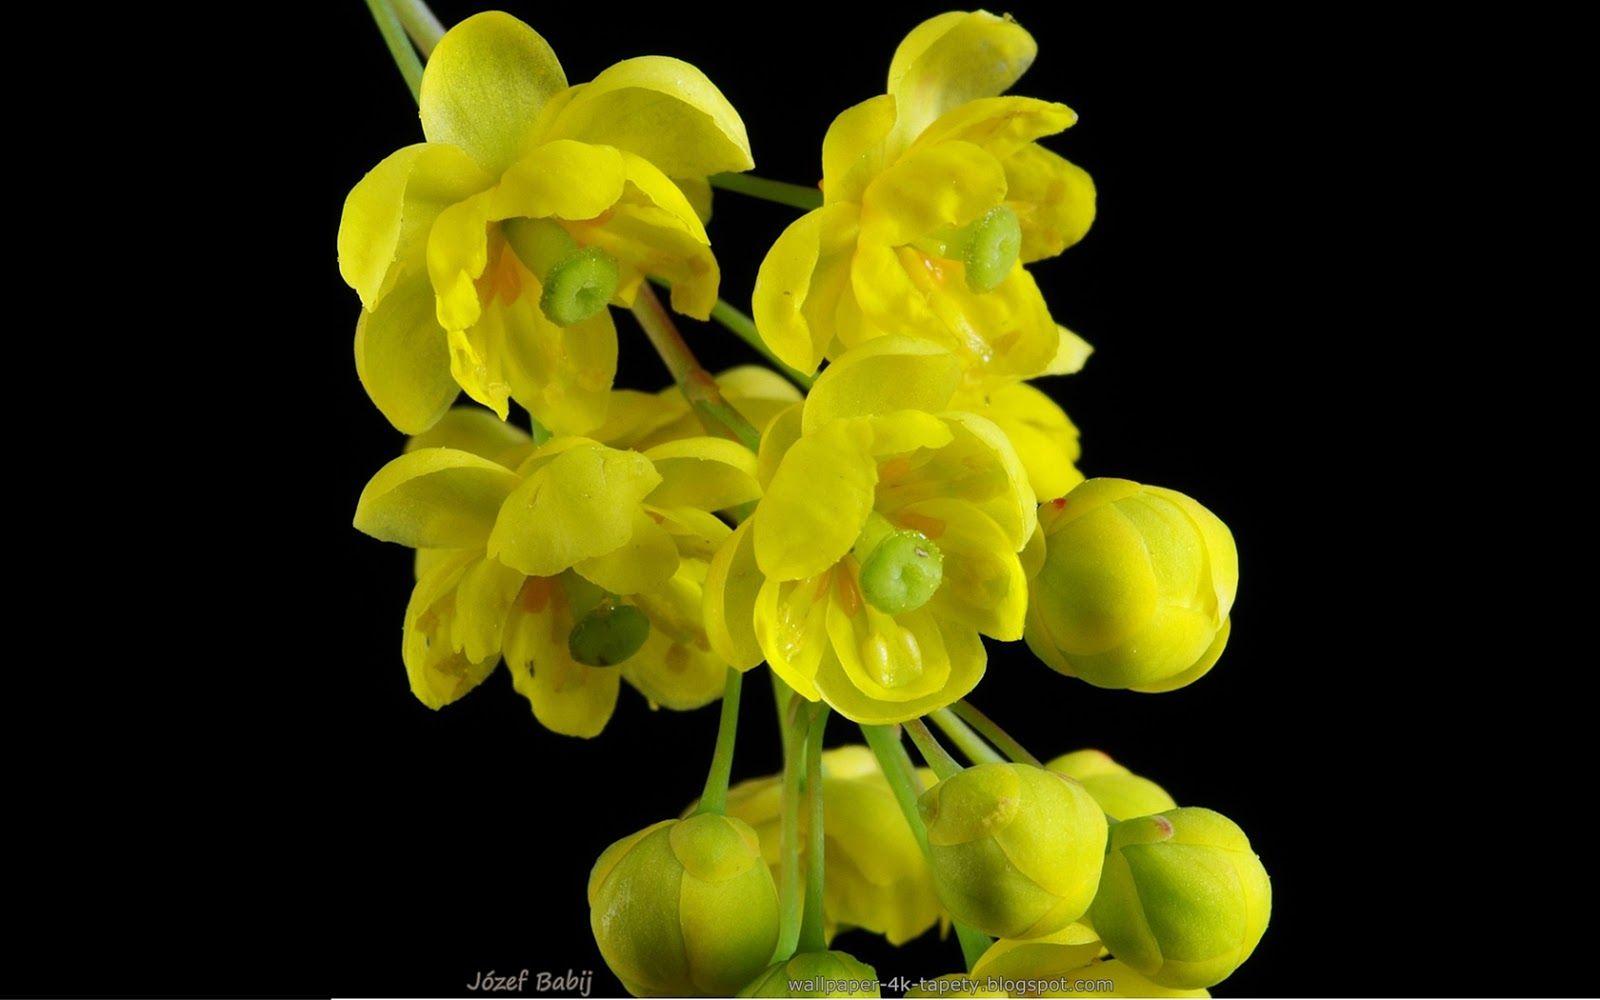 Tapety Na Pulpit 4k Ultra Hd Full Hd I Inne Rozdzielczosci Berberys Zwyczajny Kwiaty Berberis Vulgaris Wallpaper Plants The Originals